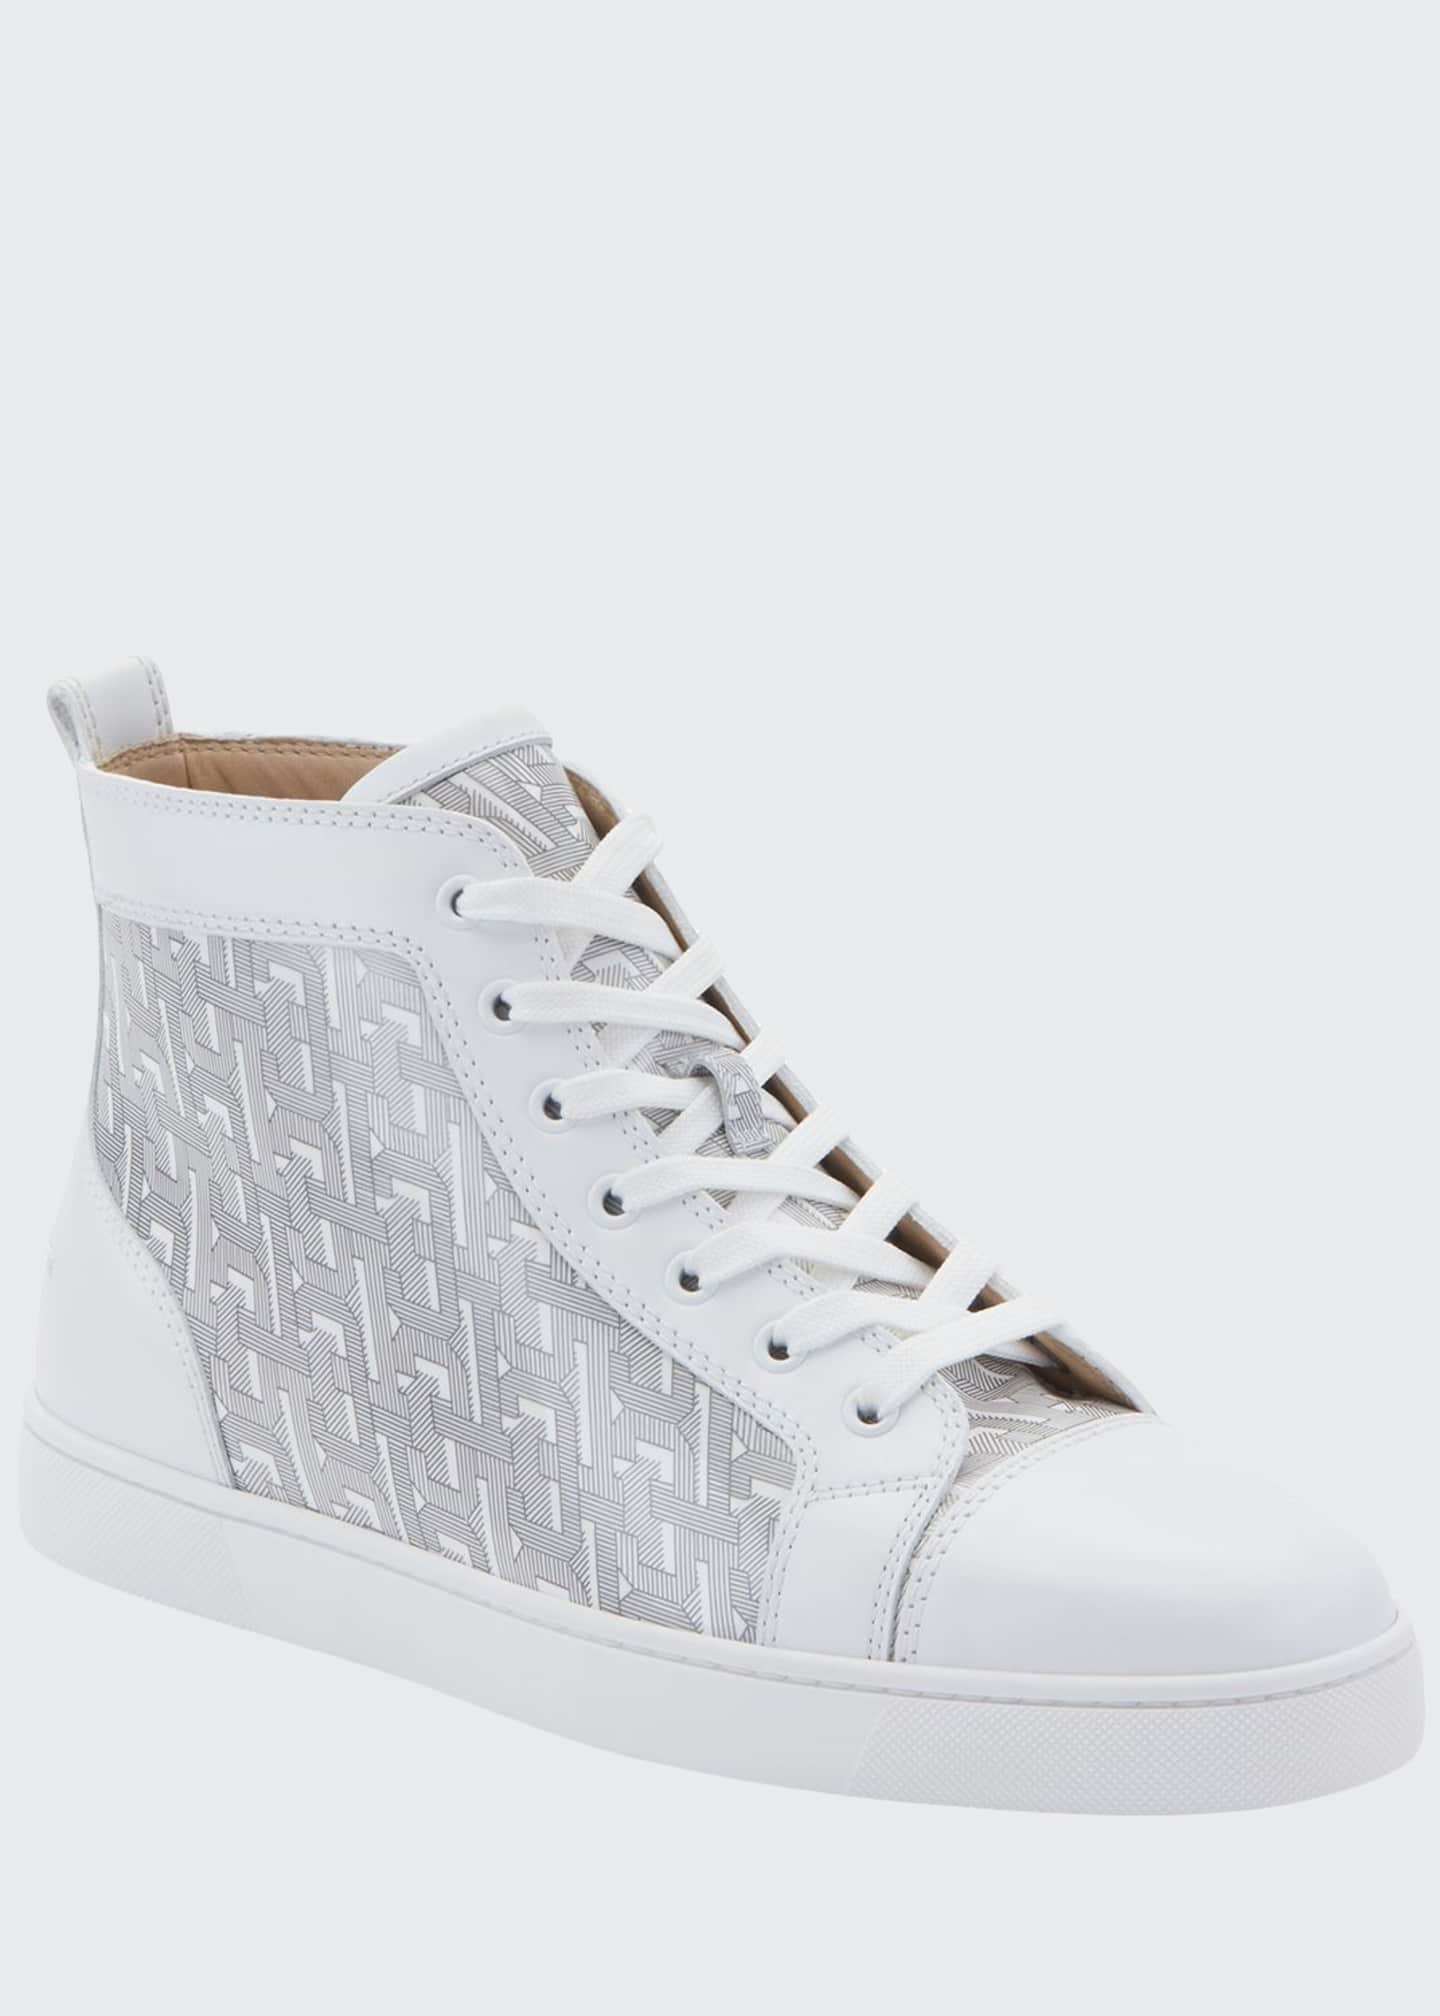 Christian Louboutin Men's Louis Graphic-Print Mid-Top Sneakers